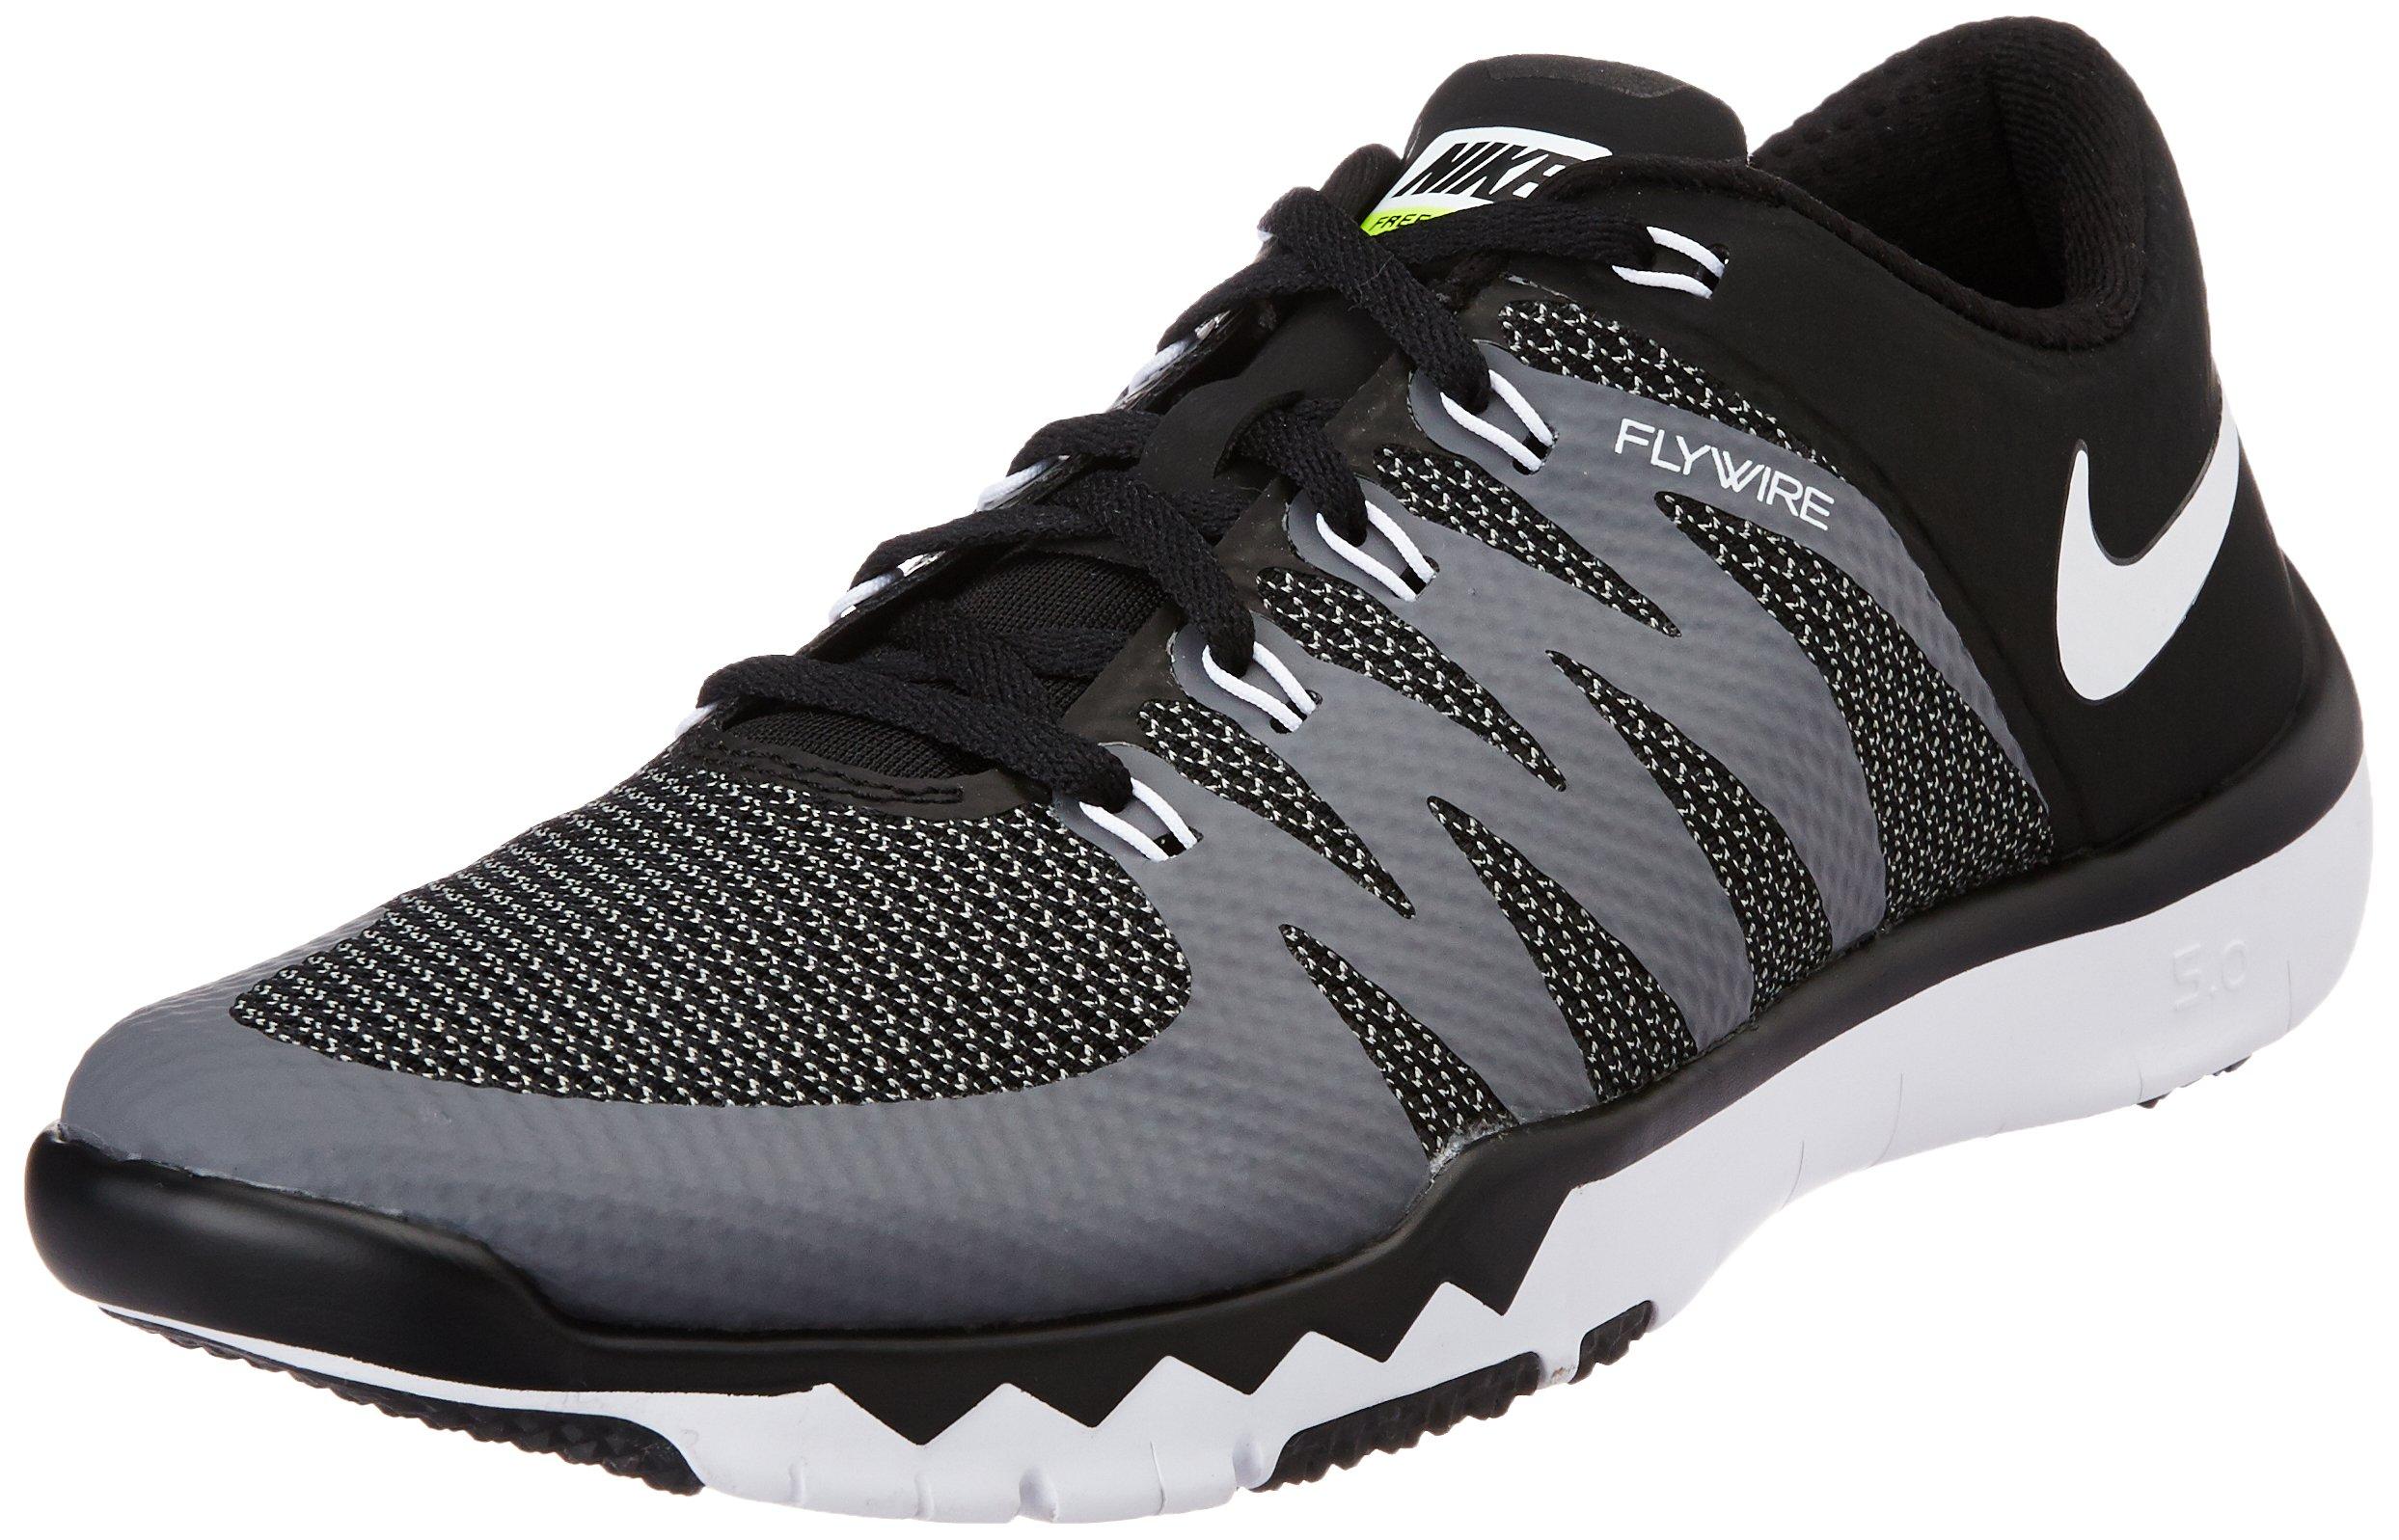 new product b81e6 d14fc Galleon - Nike Men s Free Trainer 5.0 V6 Training Shoe Black Dark Grey Volt White  Size 8 M US